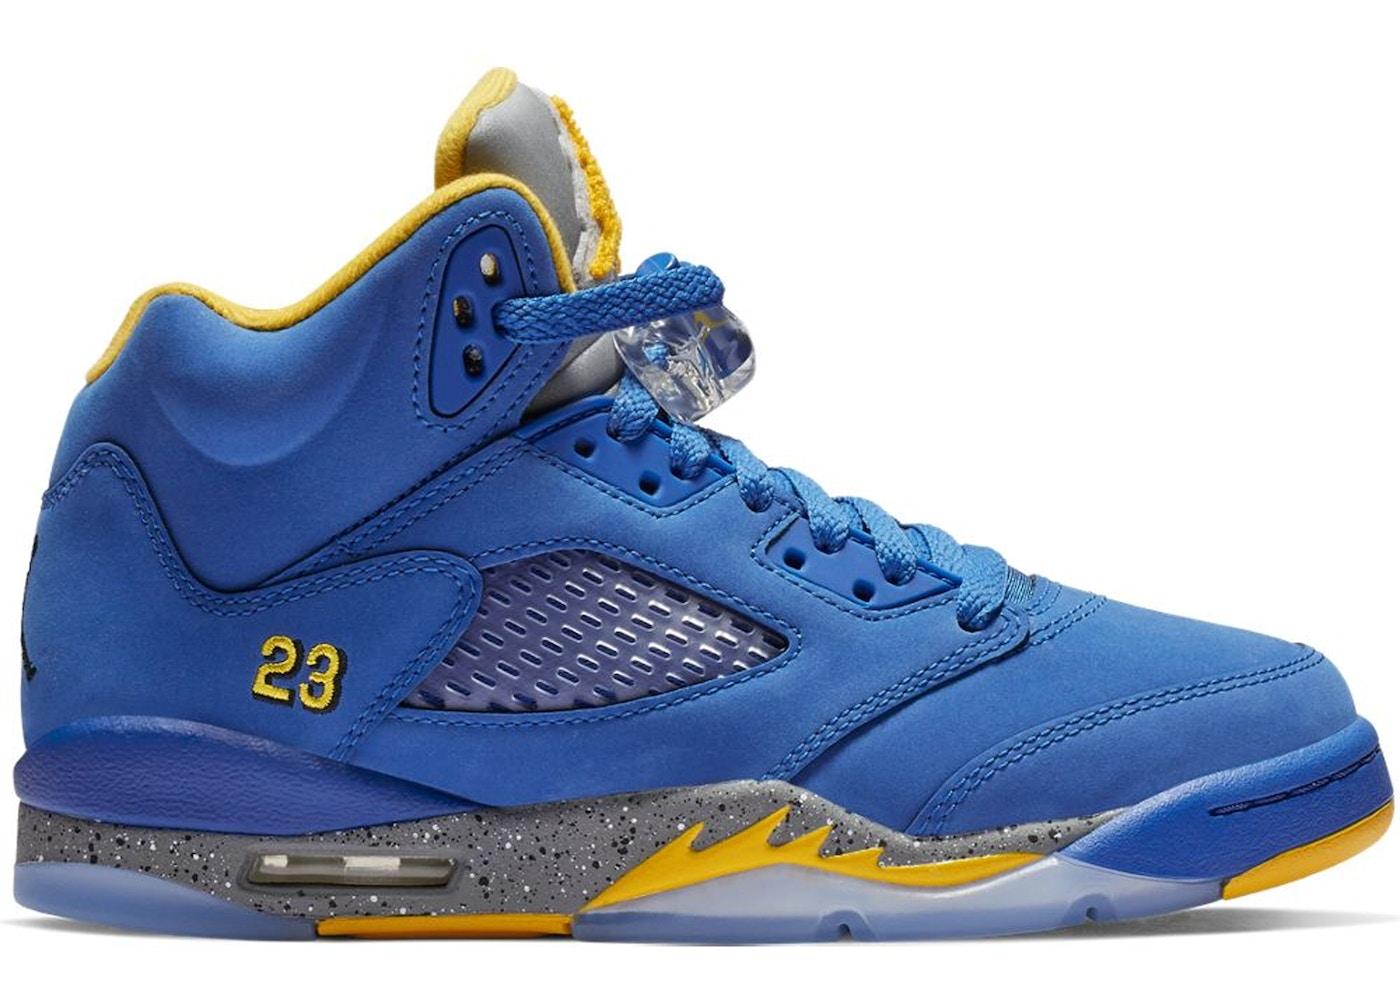 faa638a2f83 Buy Air Jordan 5 Shoes & Deadstock Sneakers